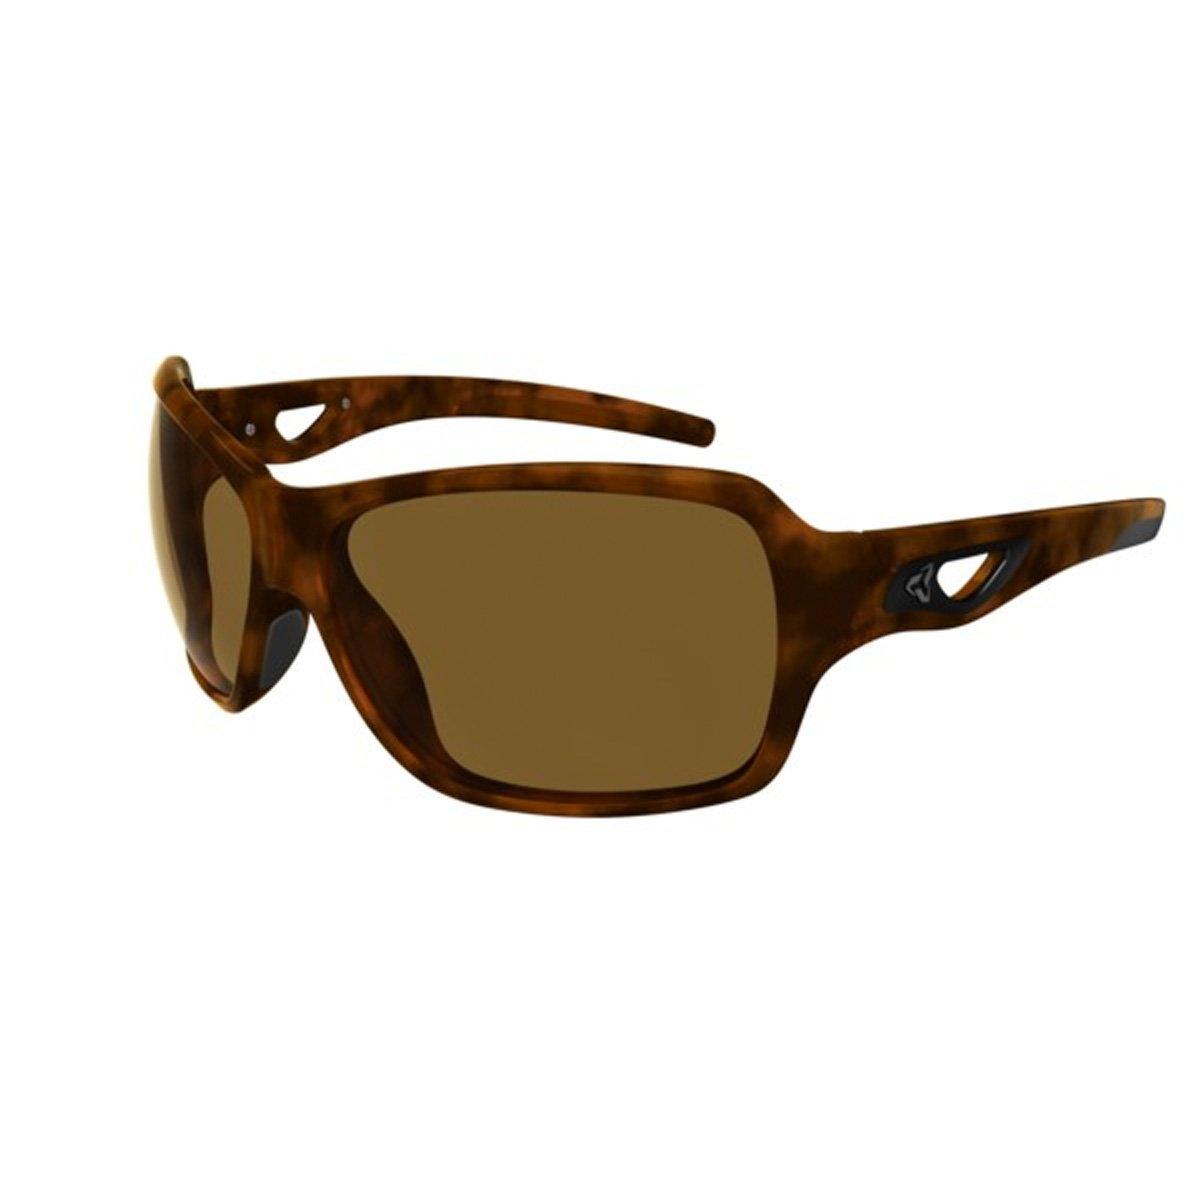 Ryders Eyewear Carlita Antifogサングラス – 2トーン  DEMI / BROWN LENS ANTI-FOG B07BKPZS15